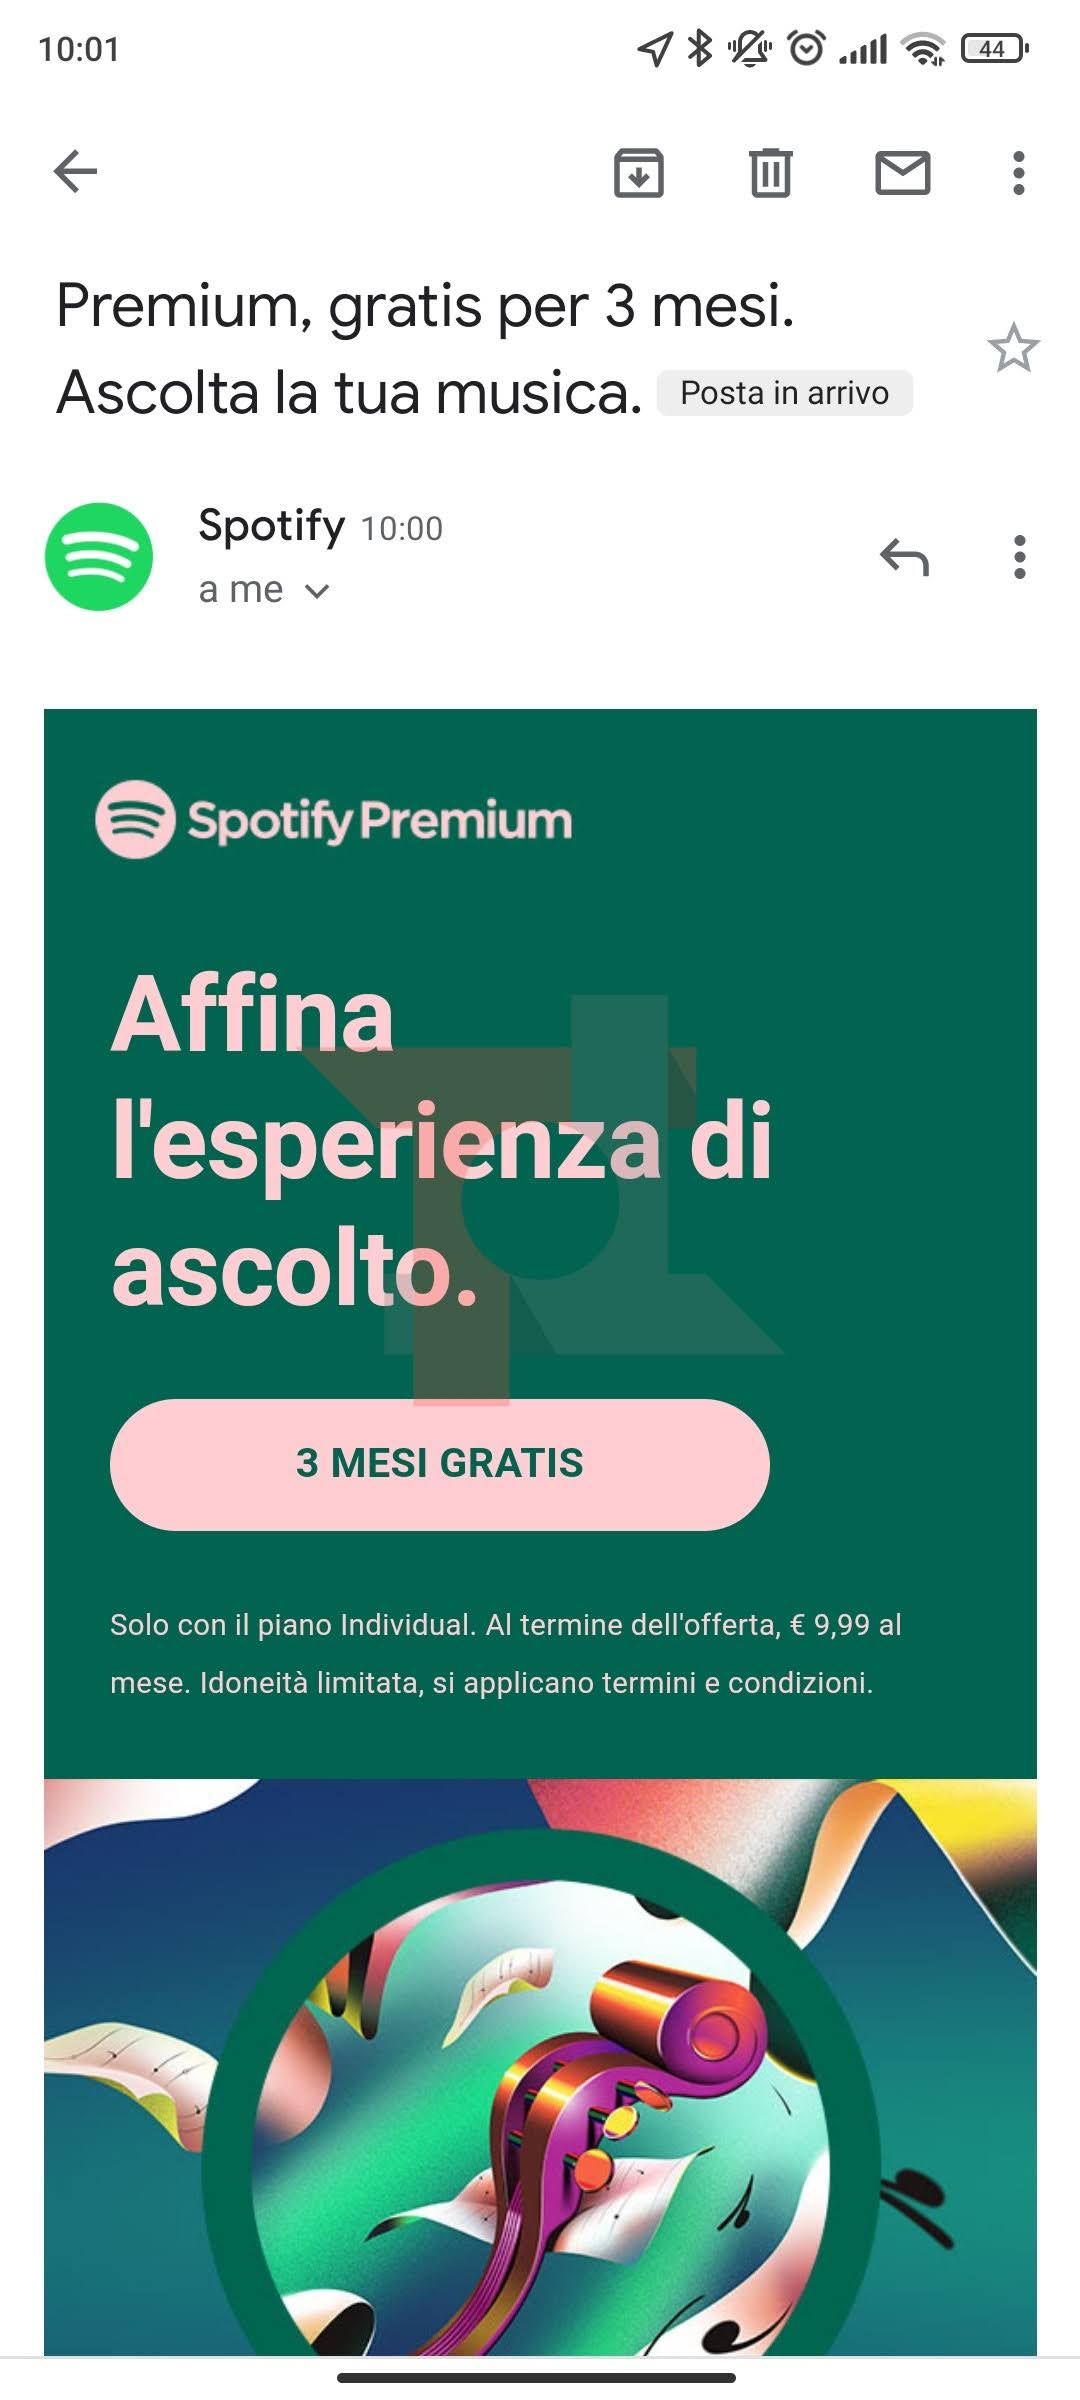 spotify premium promo